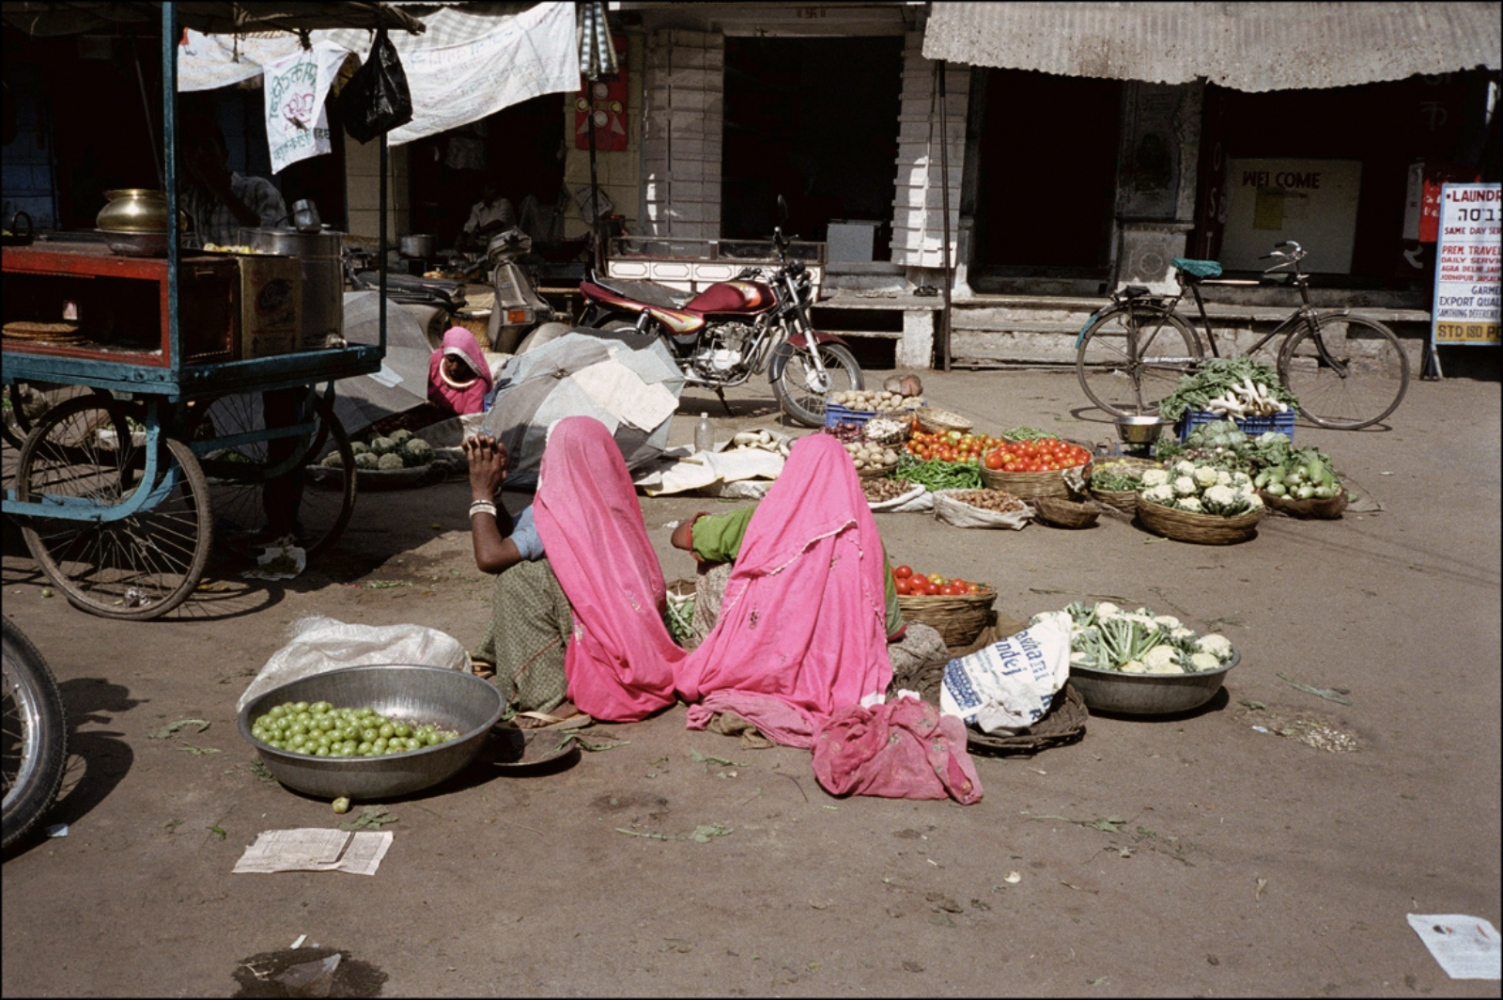 Ladies in Pink, Pushkar, India, November 2003